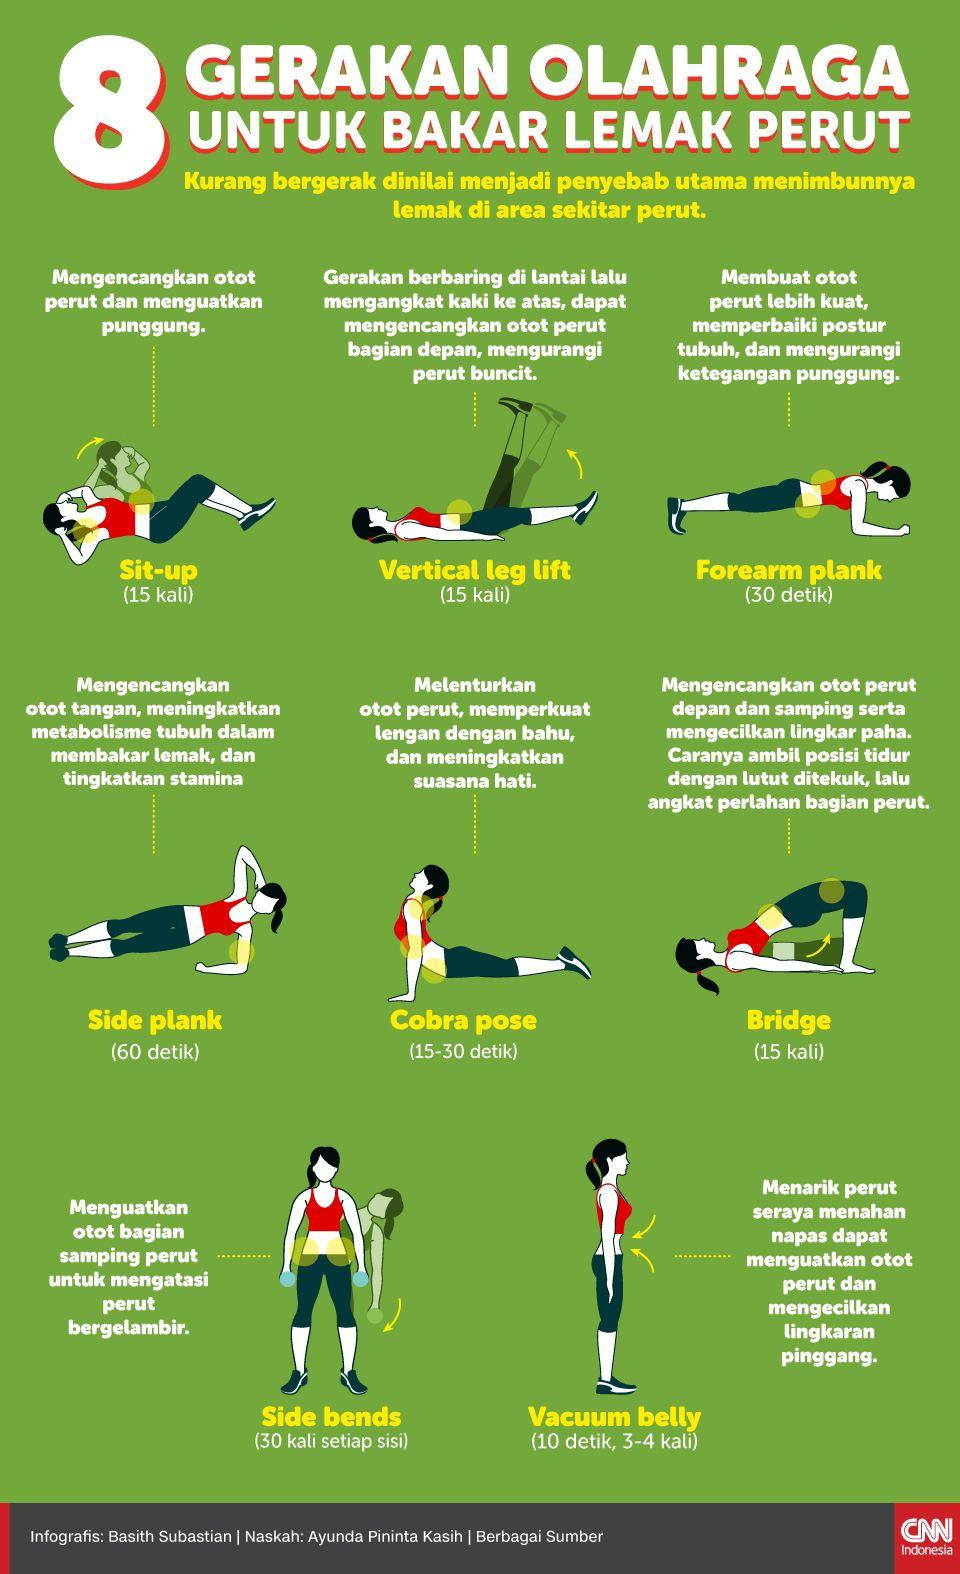 8 Gerakan Olahraga Untuk Bakar Lemak Perut Membakar Lemak Perut Latihan Penurunan Berat Badan Abs Workout Routines